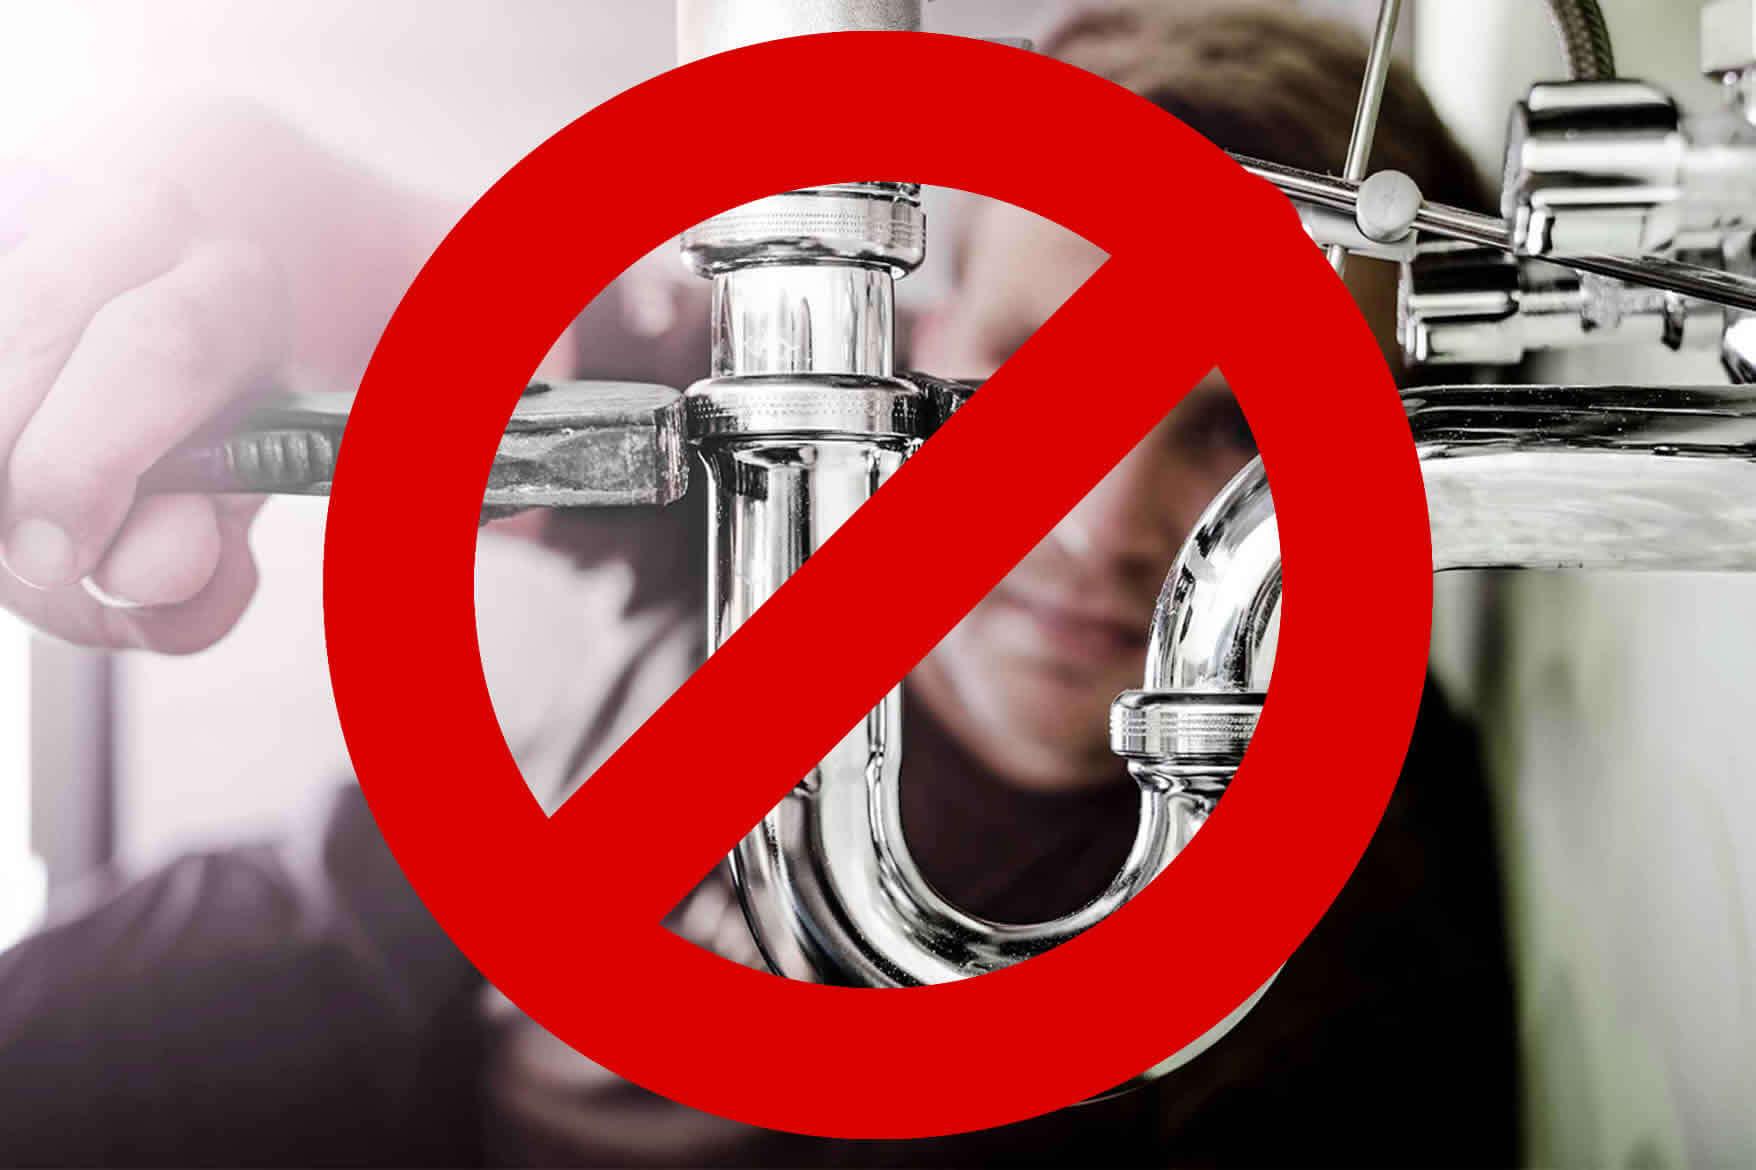 Plumbing Problems You Should NOT DIY